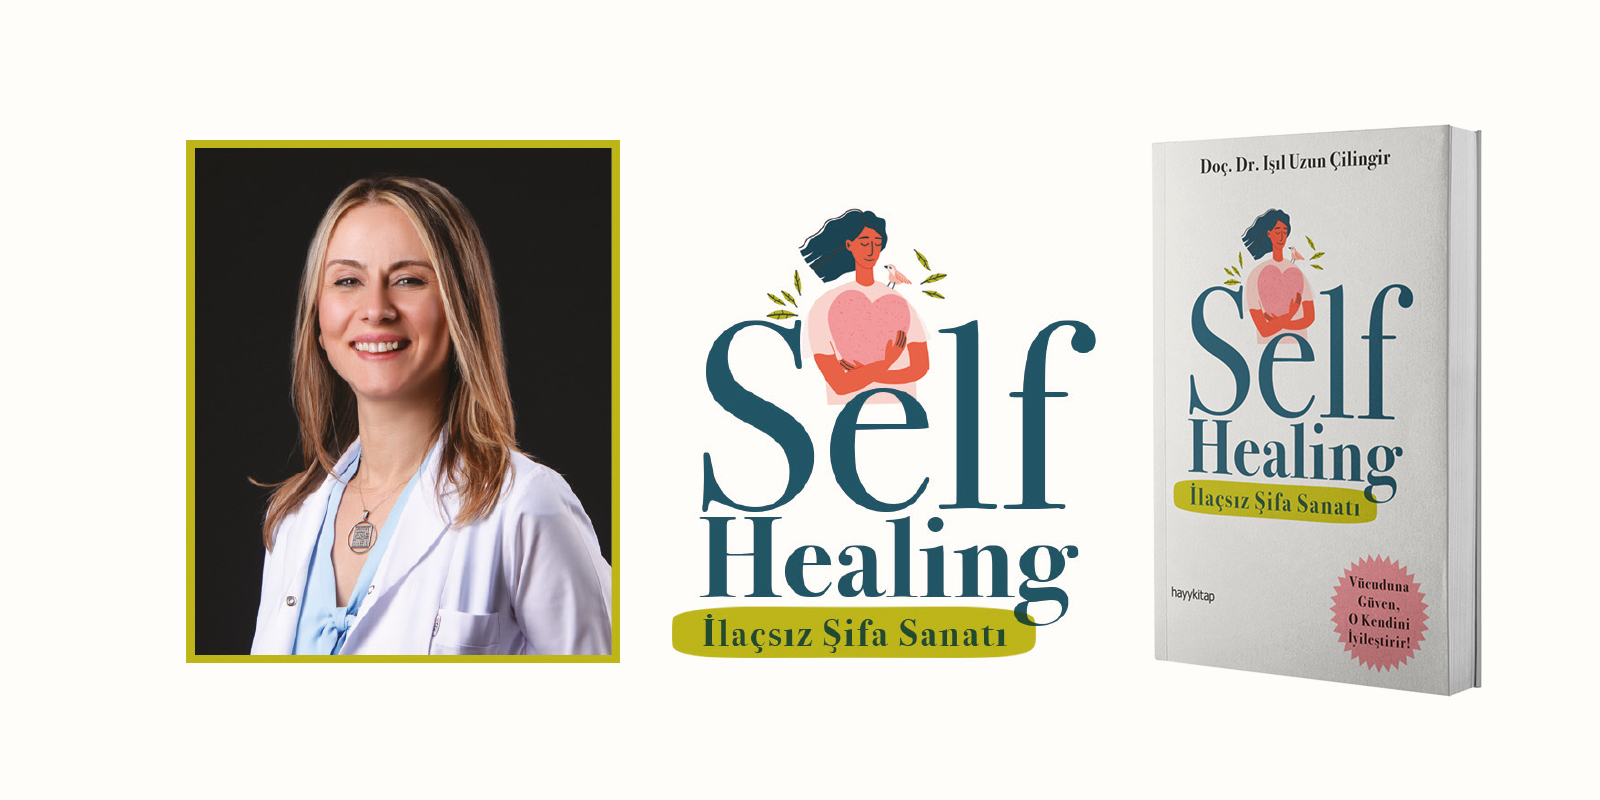 Self Healing – İlaçsız Şifa Sanatı